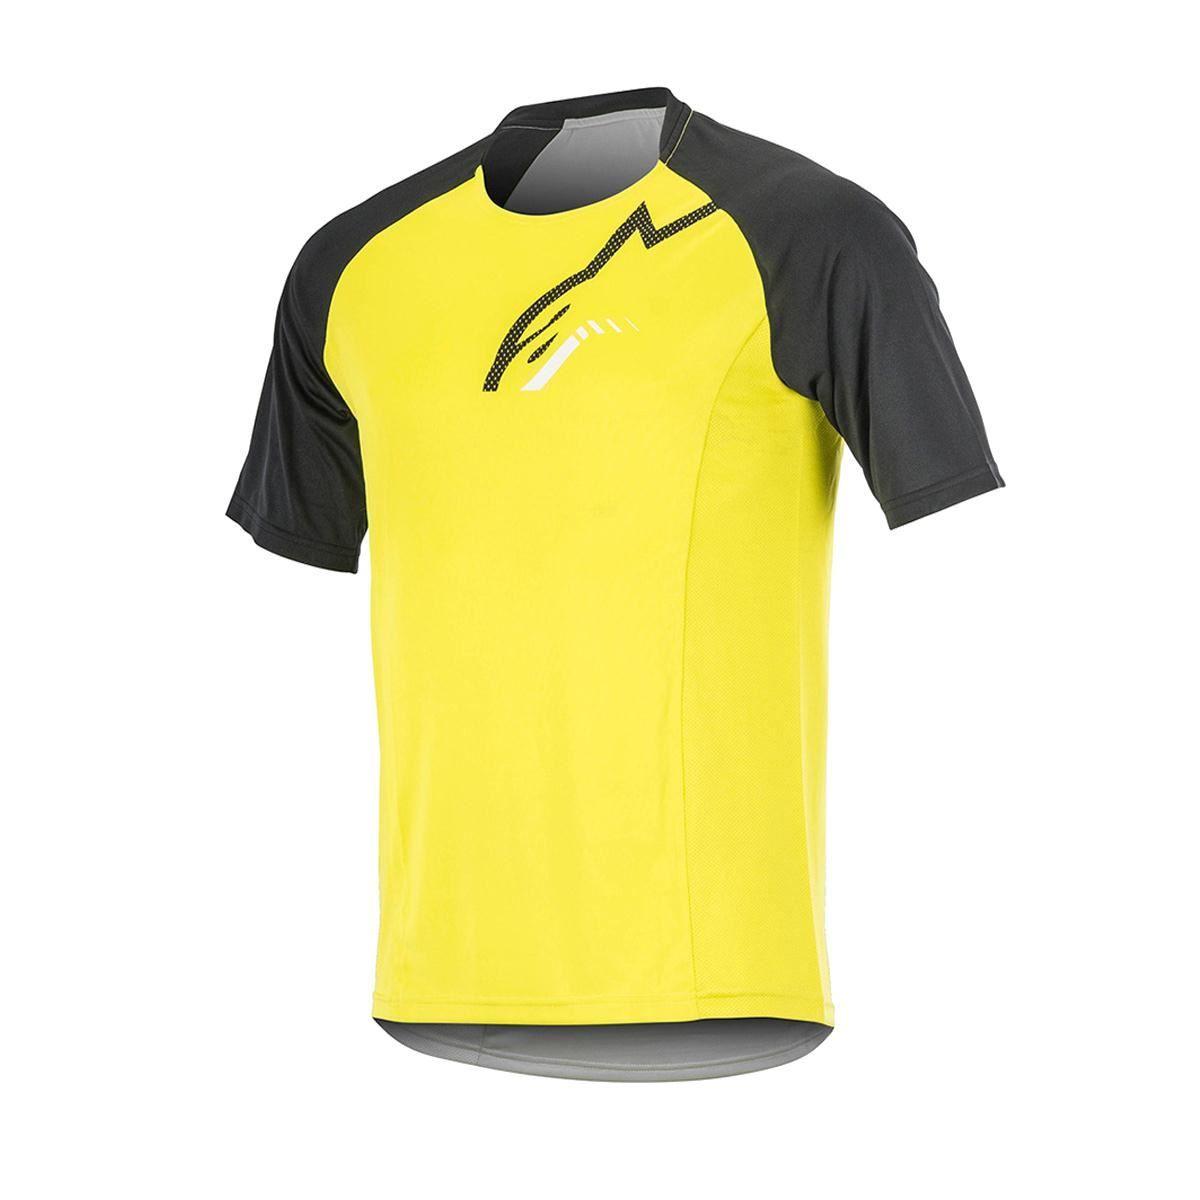 Alpinestars Trailstar Short Sleeve Jersey 2017: Acid Yellow/Black 2Xl